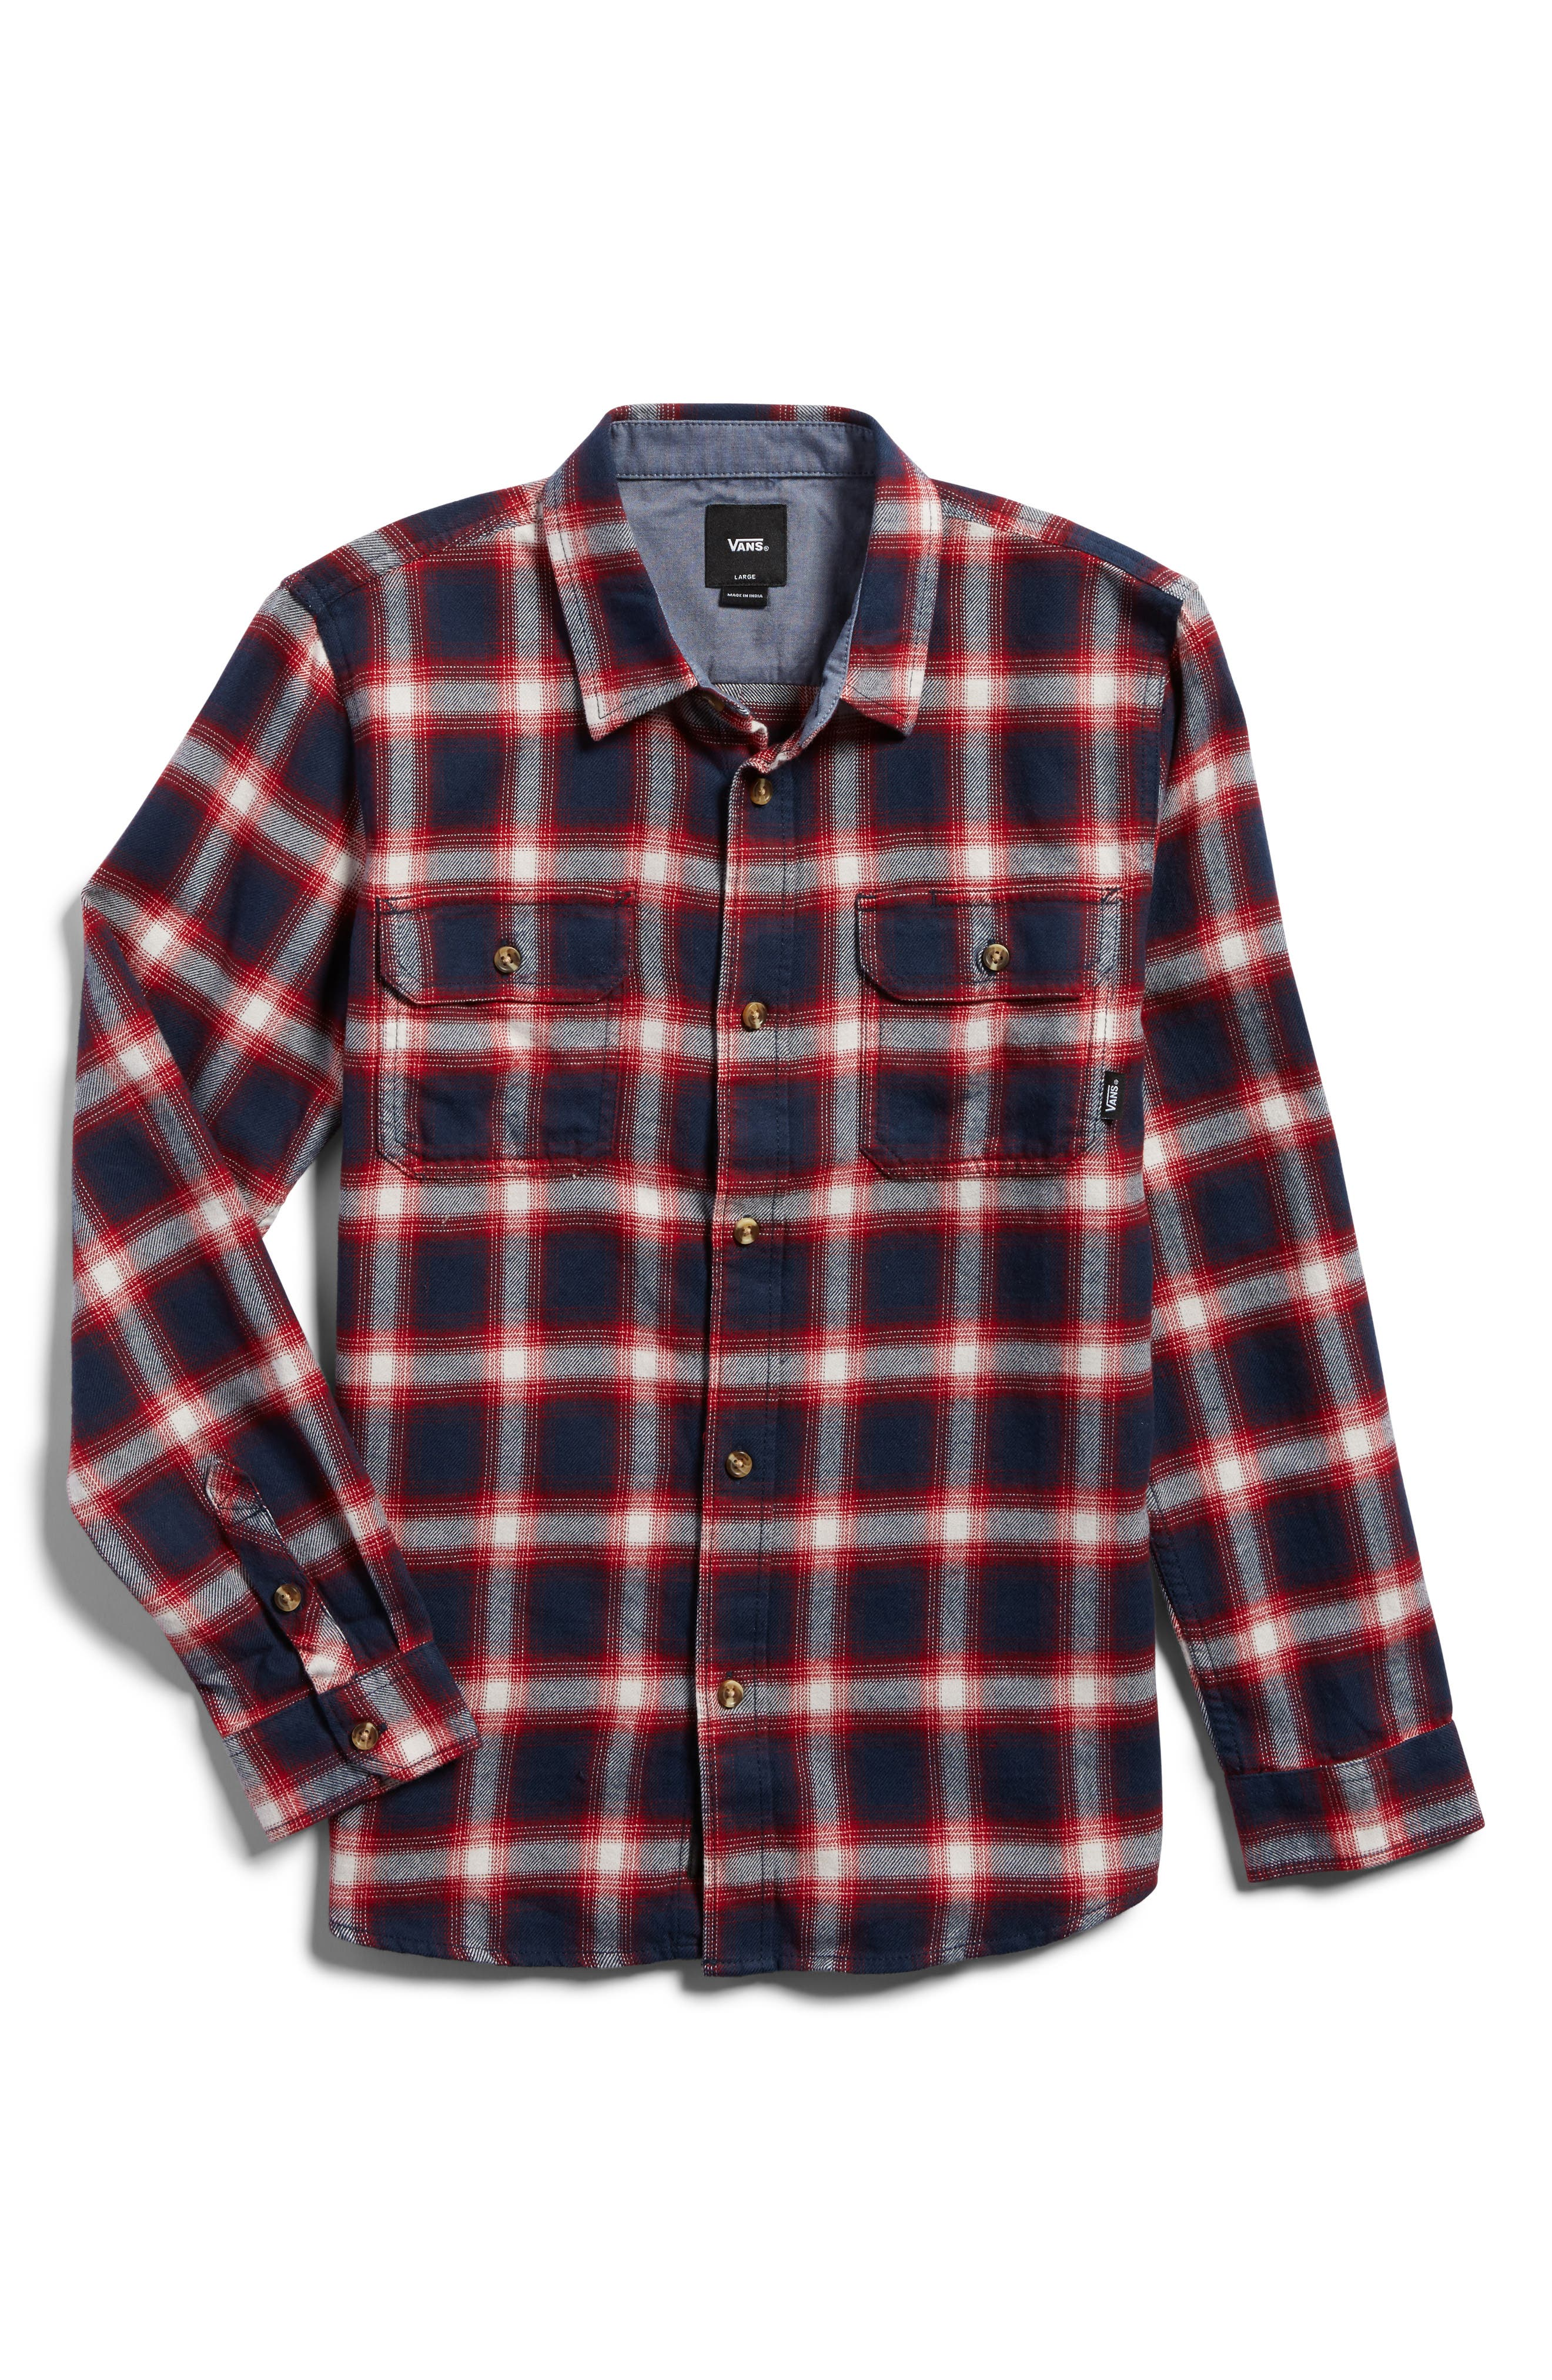 Vans Beechwood Plaid Flannel Shirt (Big Boys)